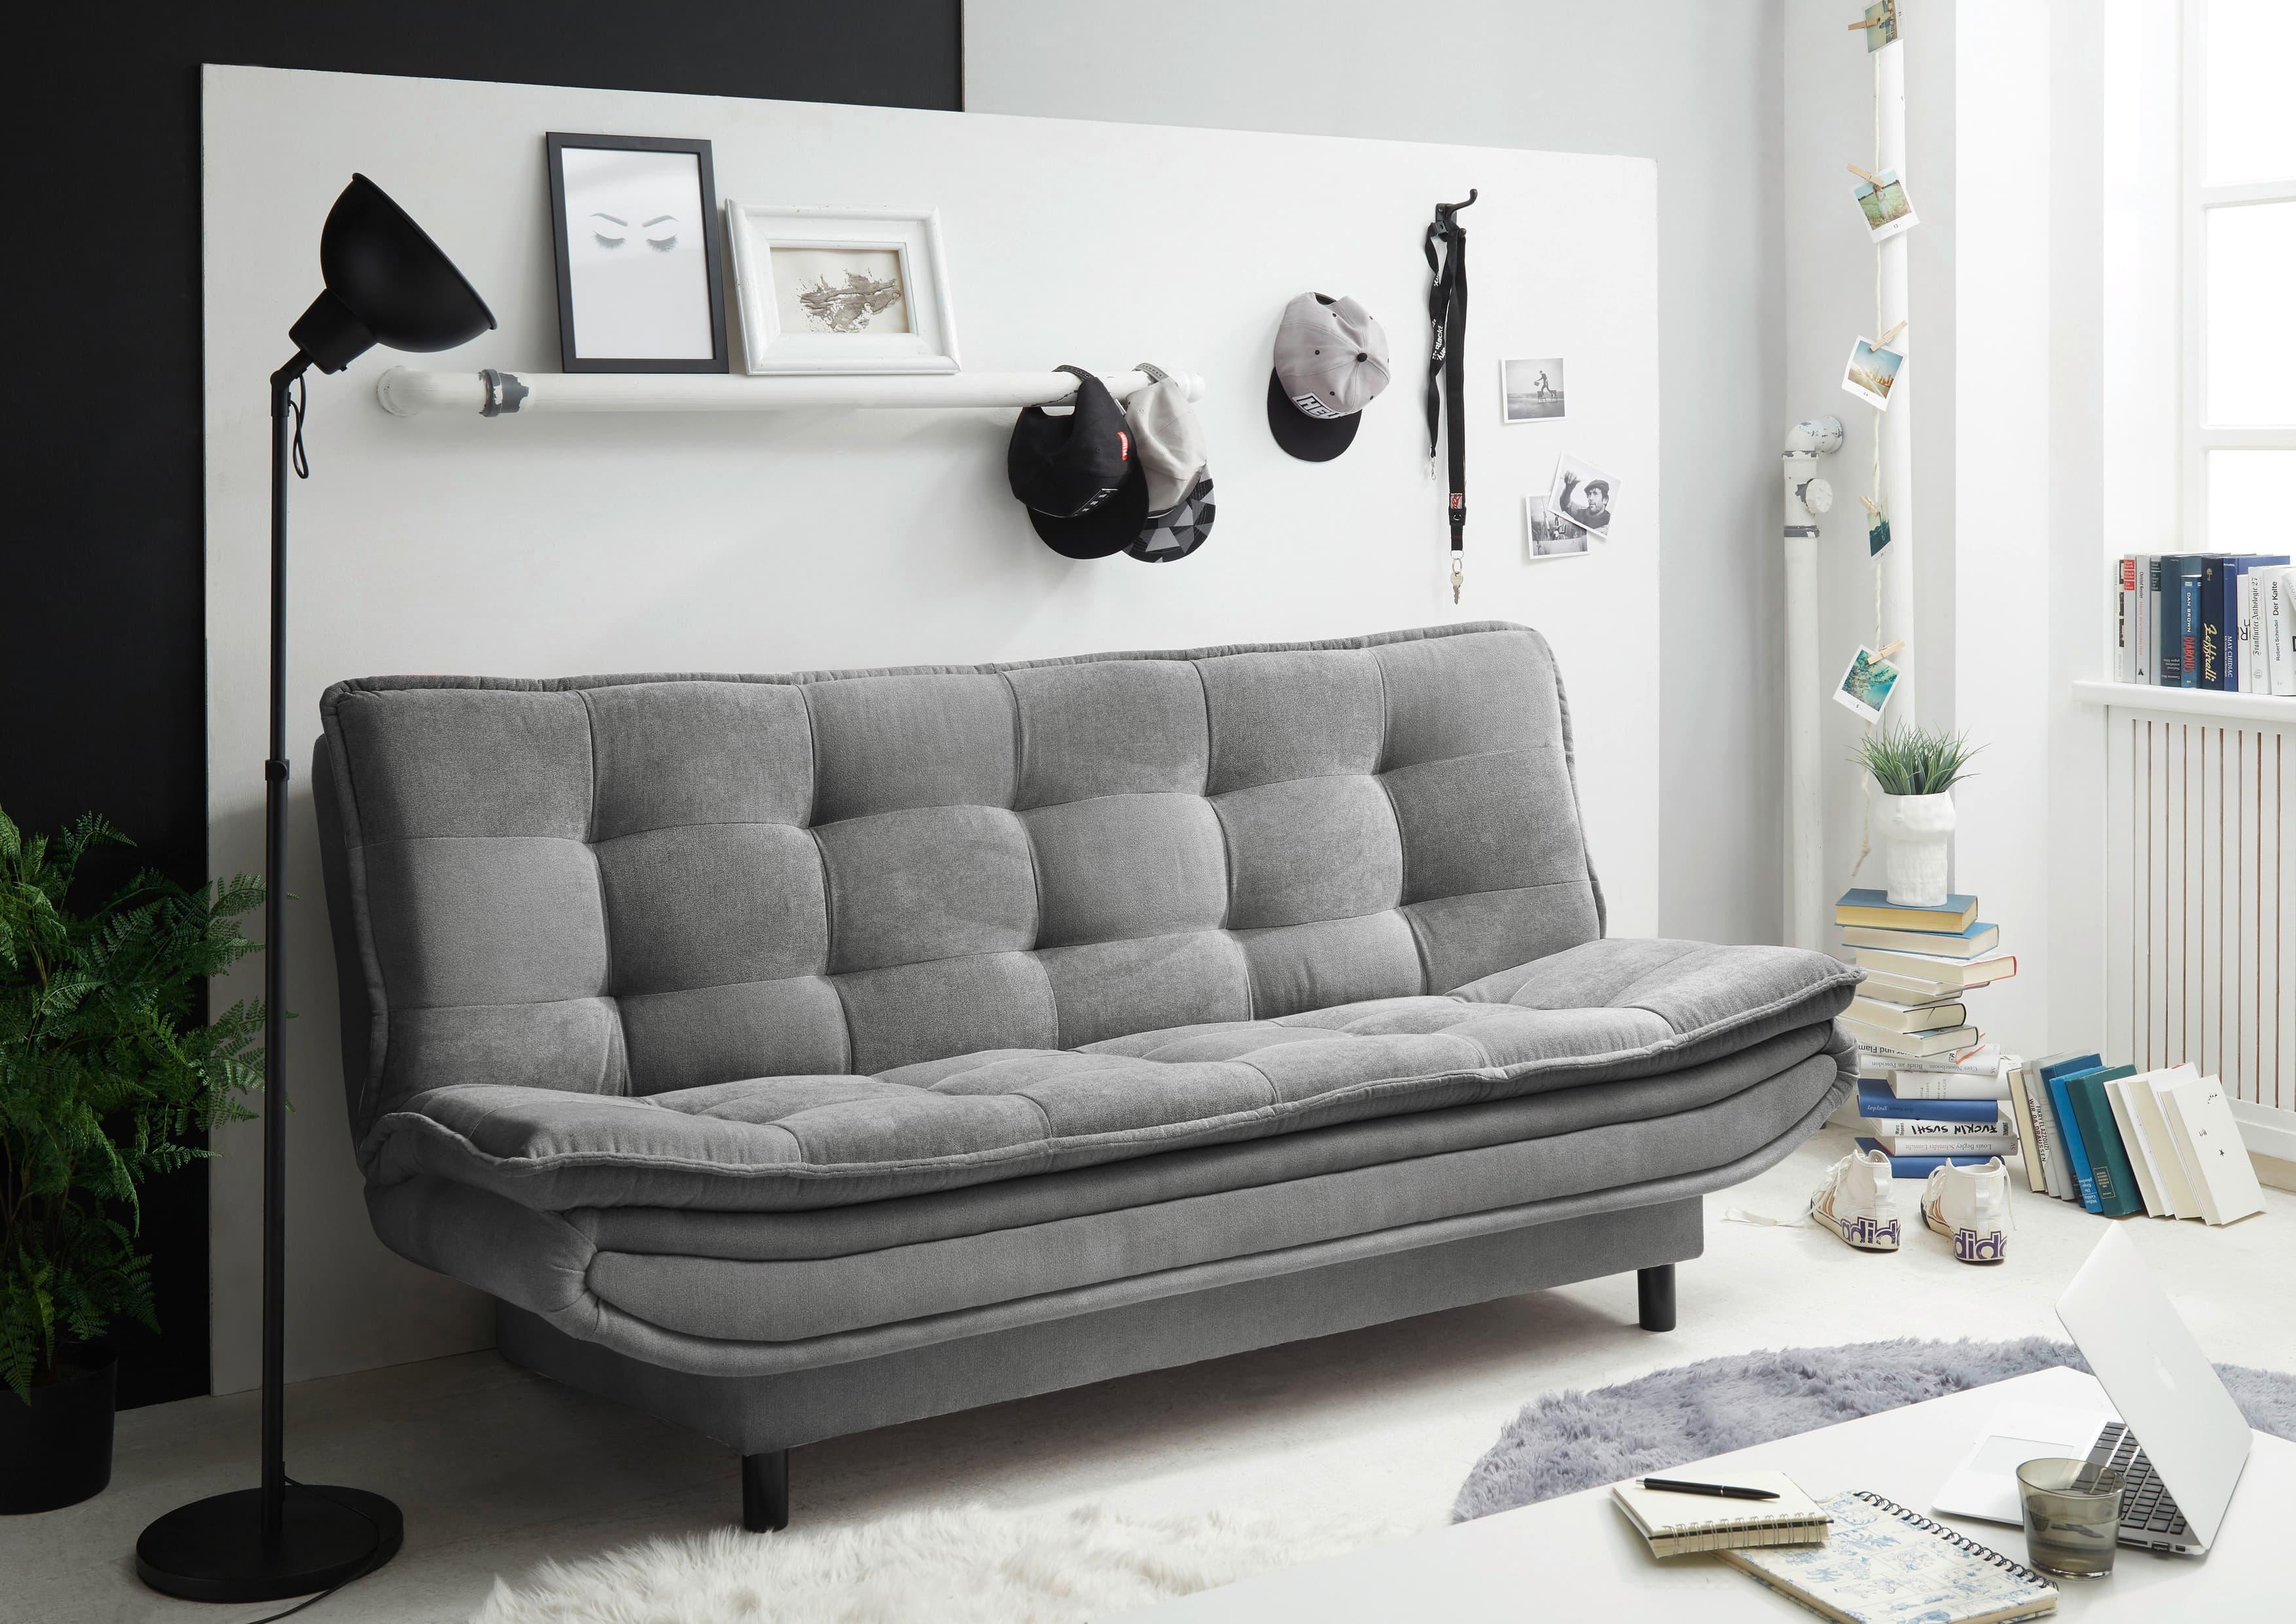 Canapea extensibila tapitata cu stofa, 3 locuri Patris Gri, l188xA89xH90 cm poza